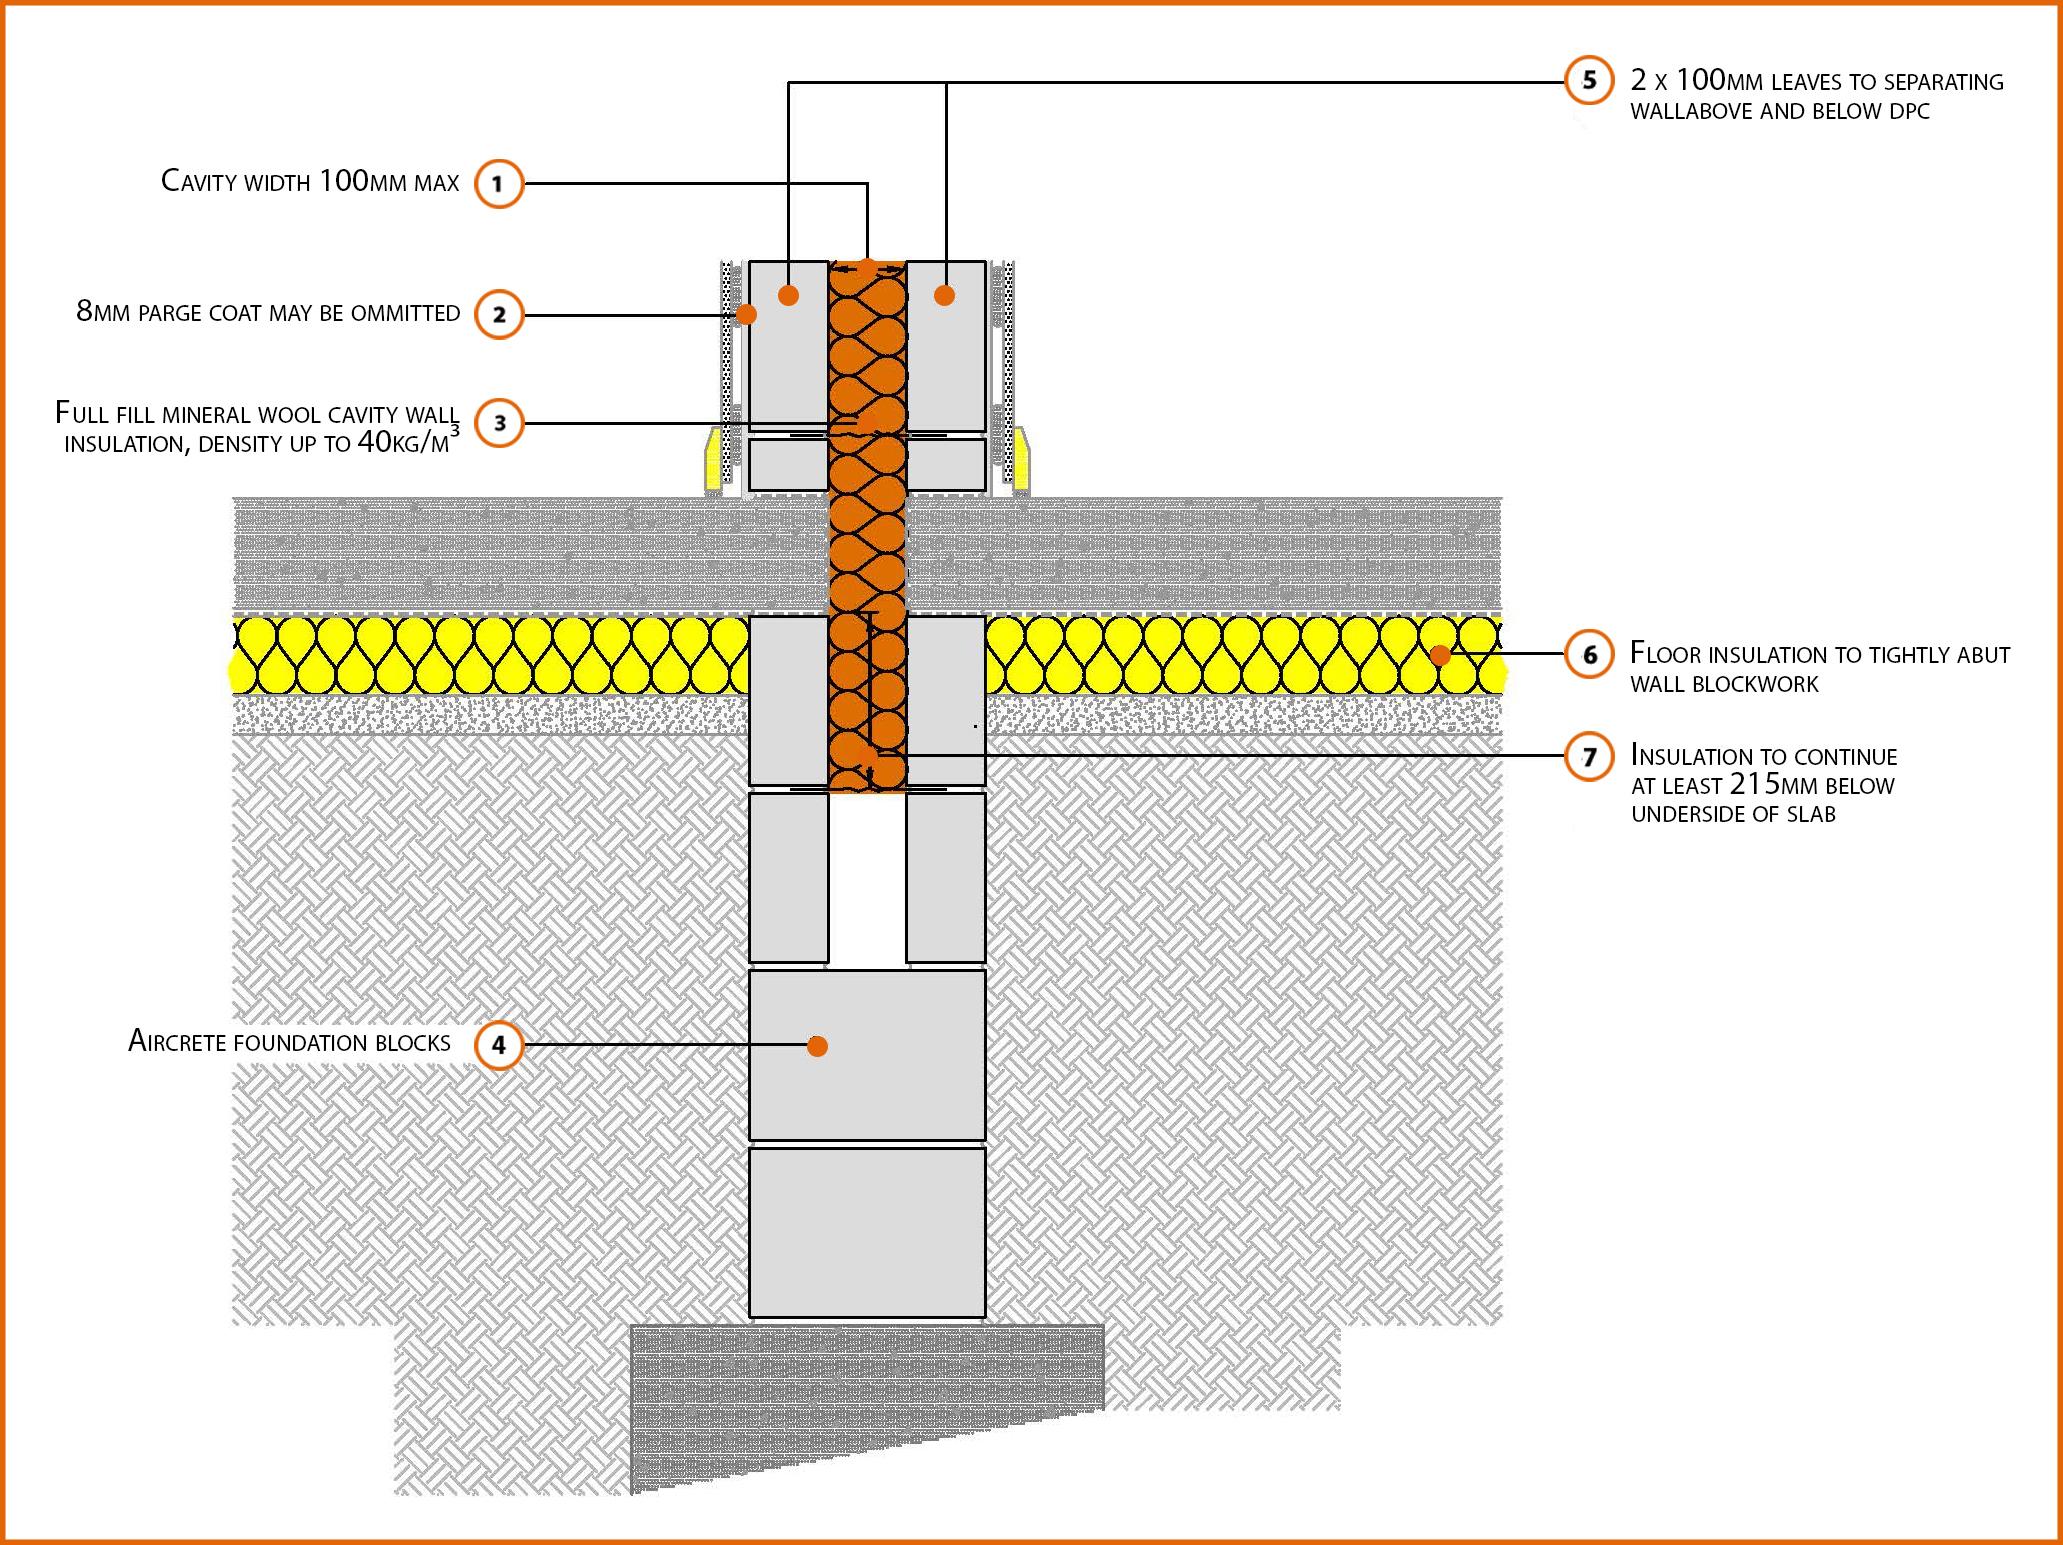 P1pcff3 Suspended Concrete Floor Insulation Below Slab